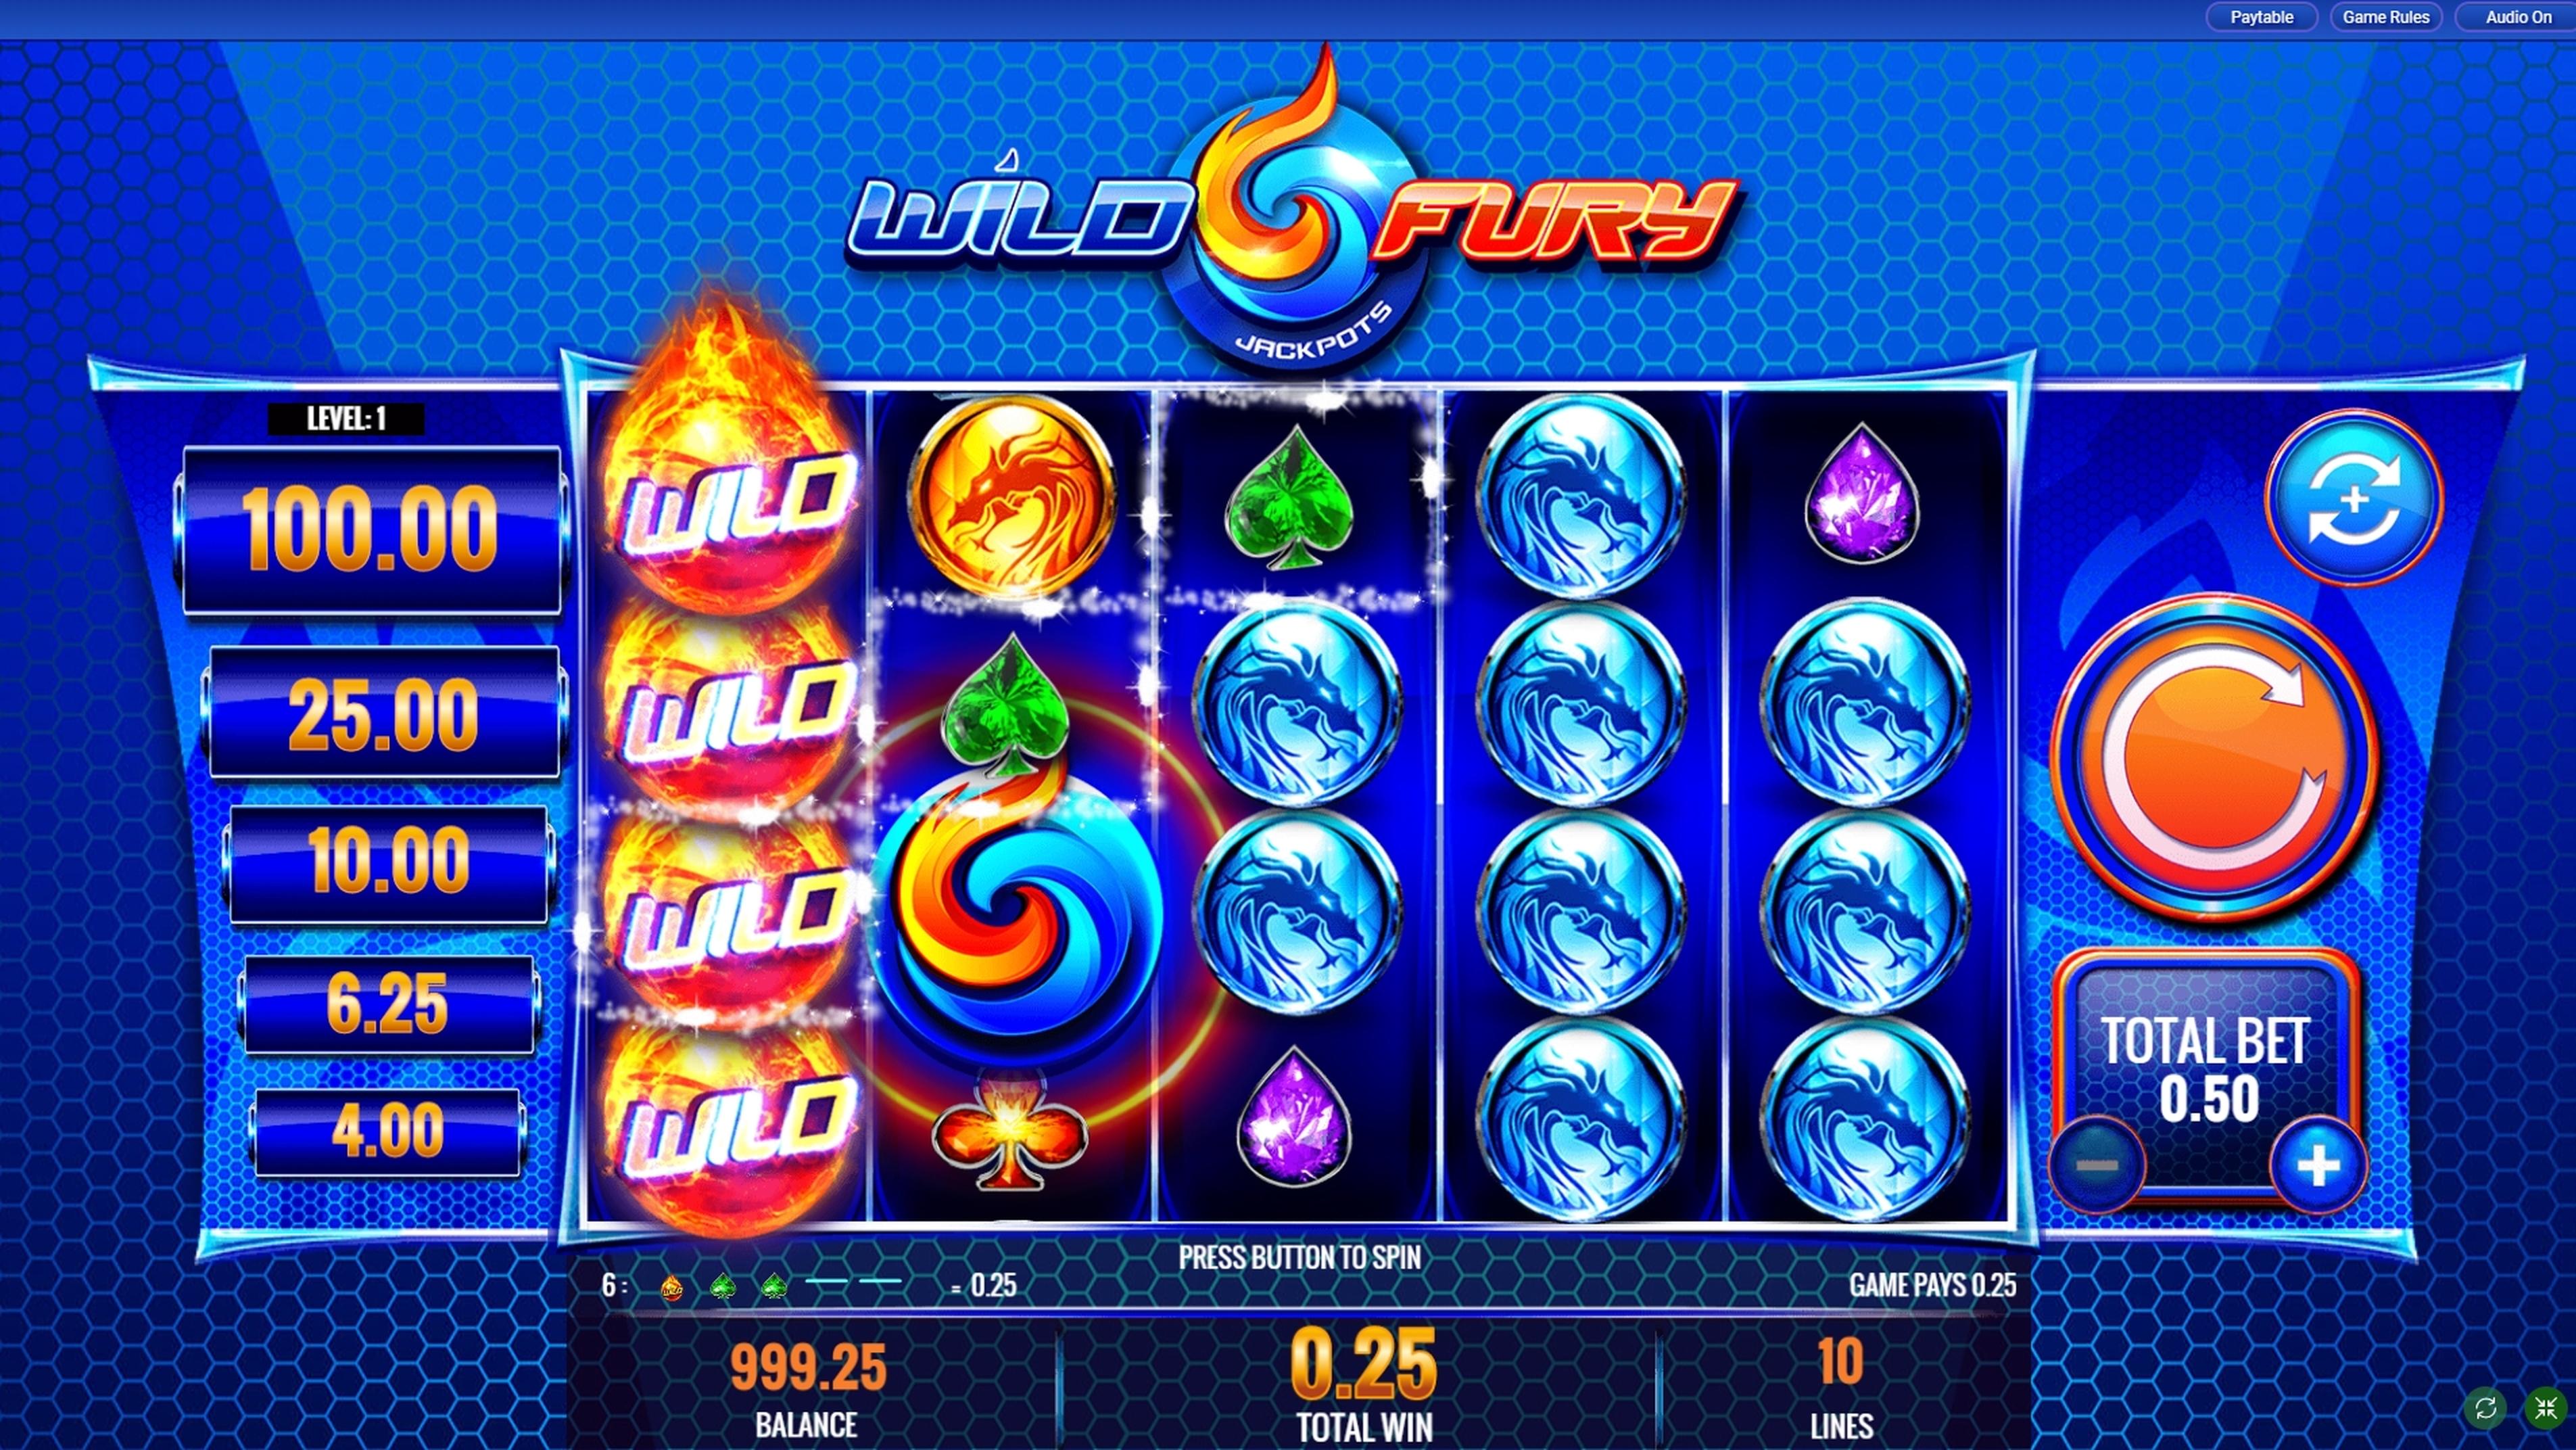 King jack casino 20 free spins